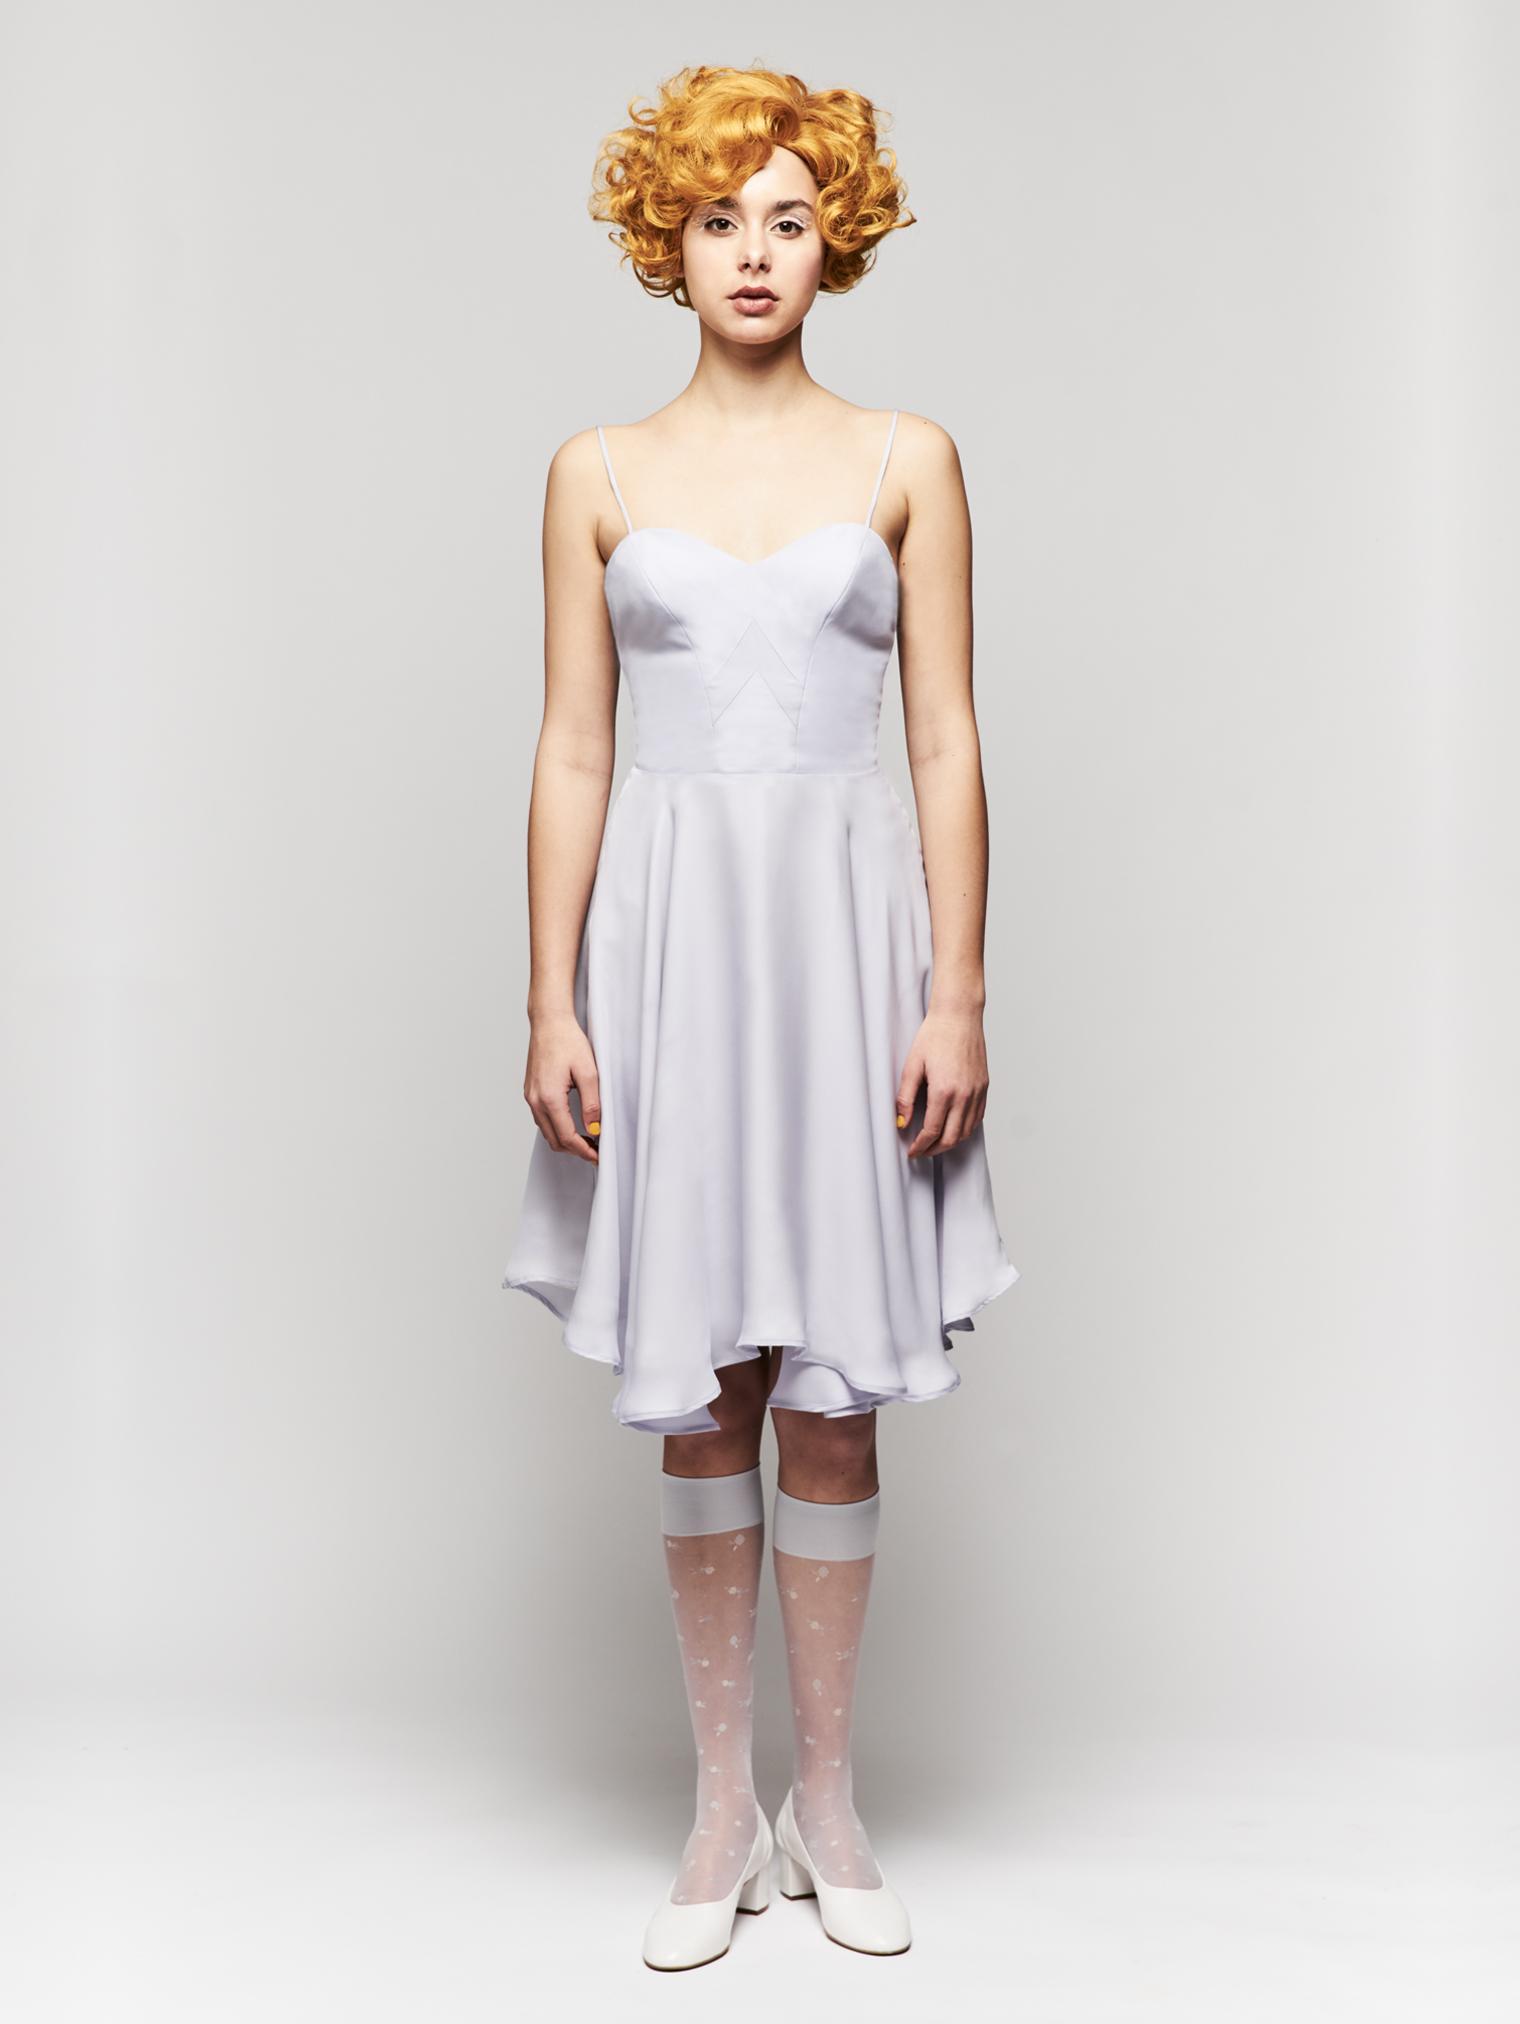 SIN BODICE DRESS  Spaghetti strap full circle lavender georgette dress. Price upon request.